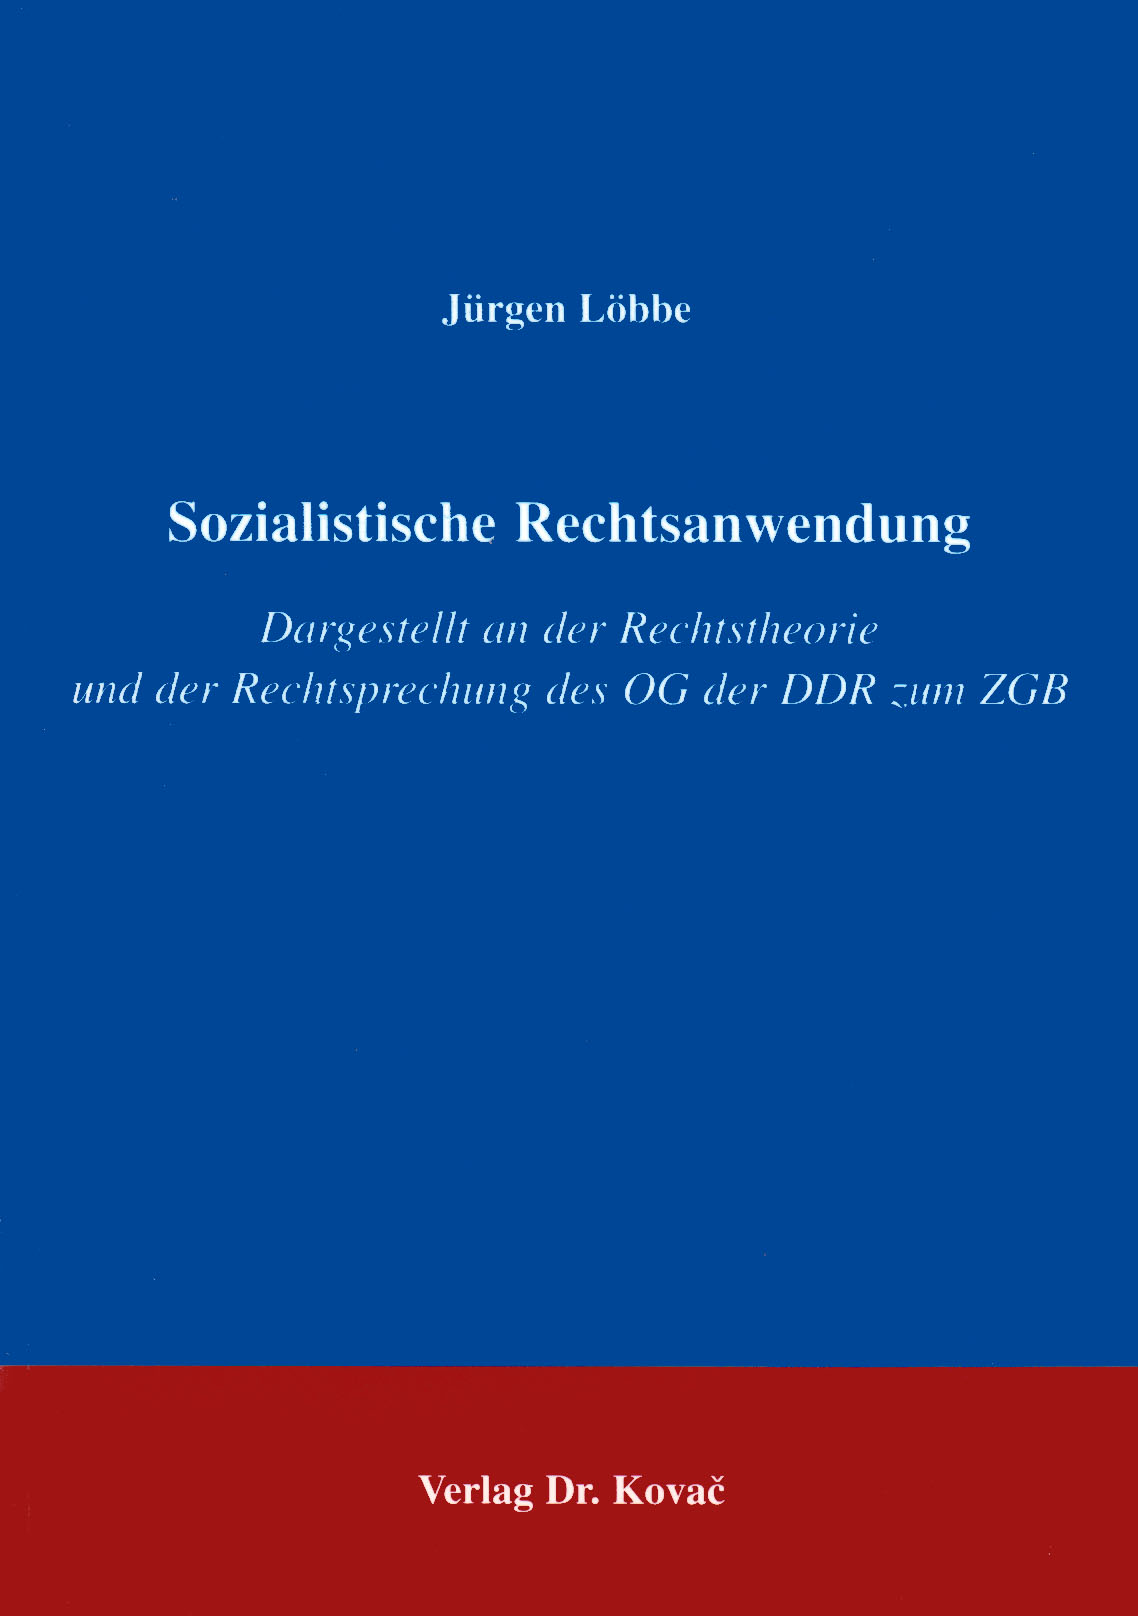 Cover: Sozialistische Rechtsanwendung